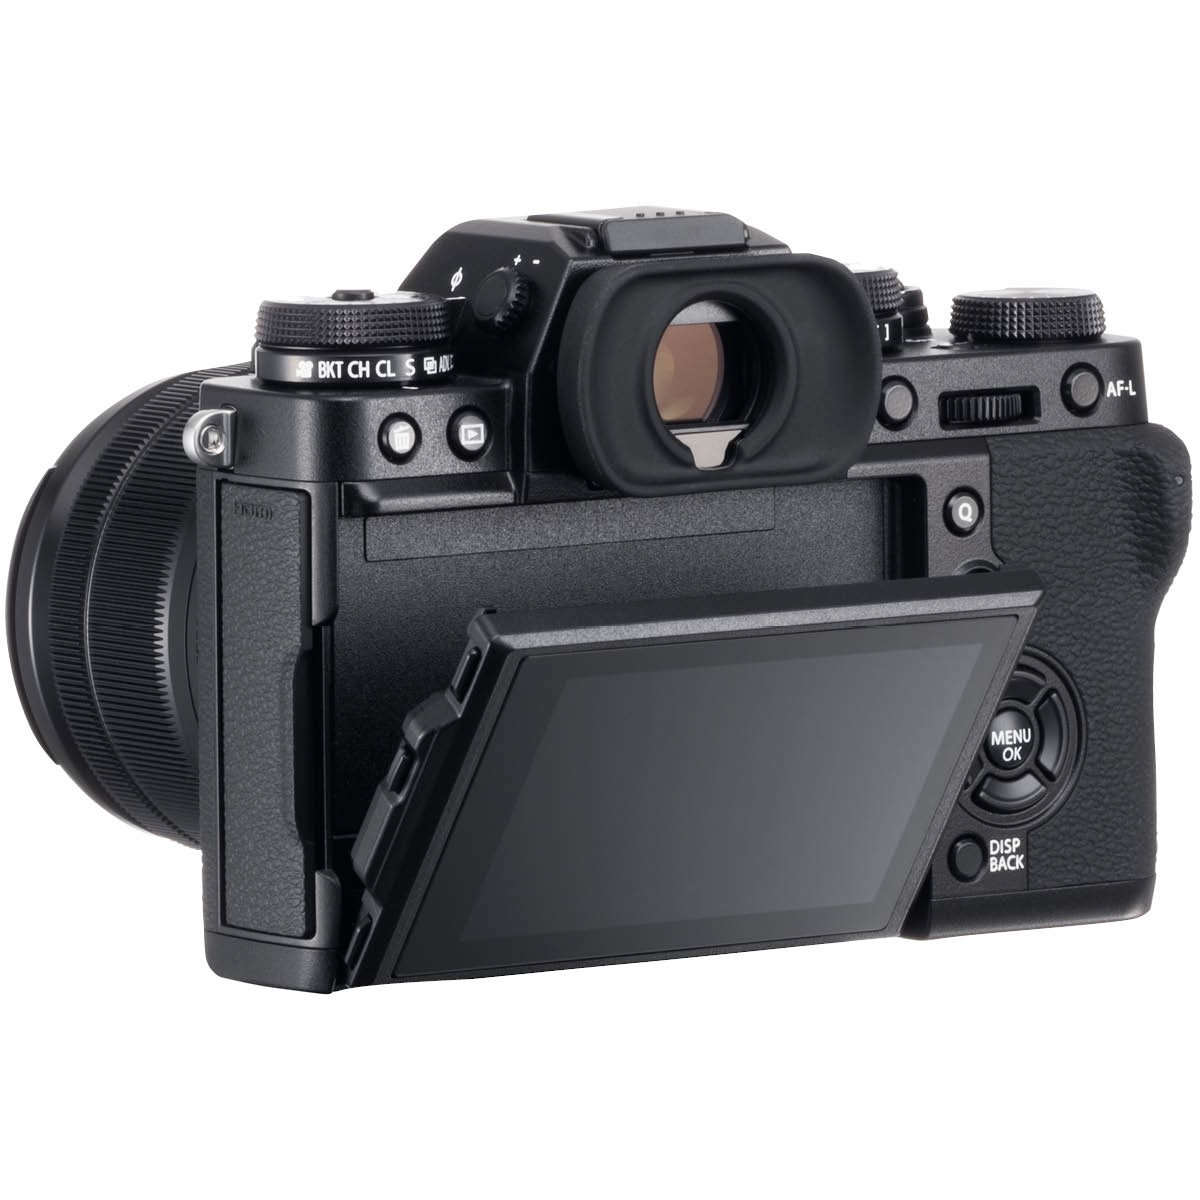 Fujifilm X-T3 Kit mit 18-55mm 1:2,8-4,0 Schwarz